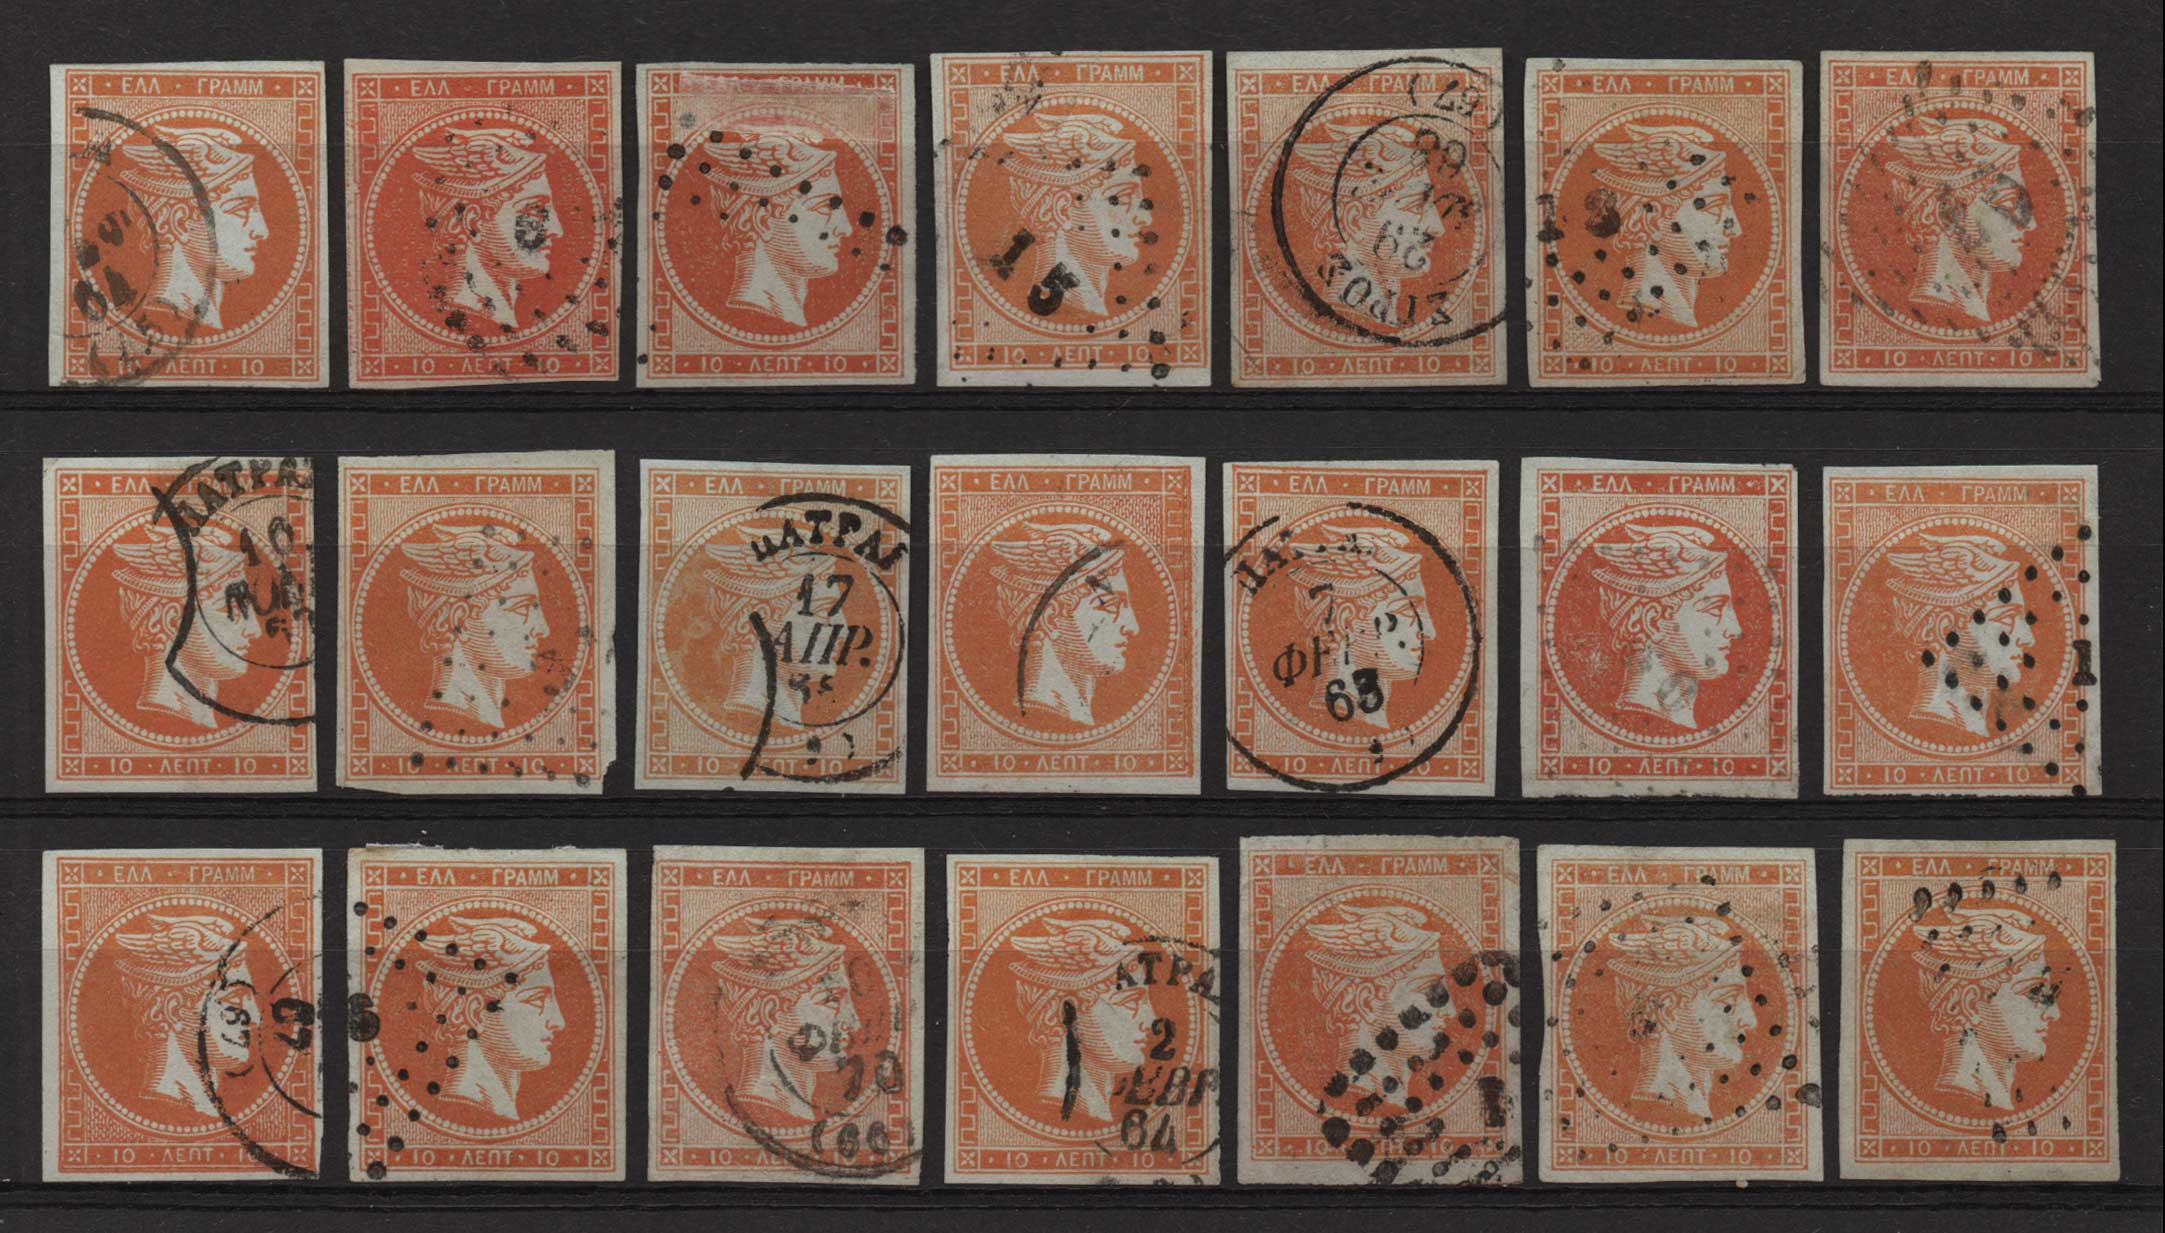 Lot 23 - -  LARGE HERMES HEAD large hermes head -  Athens Auctions Public Auction 75 General Stamp Sale